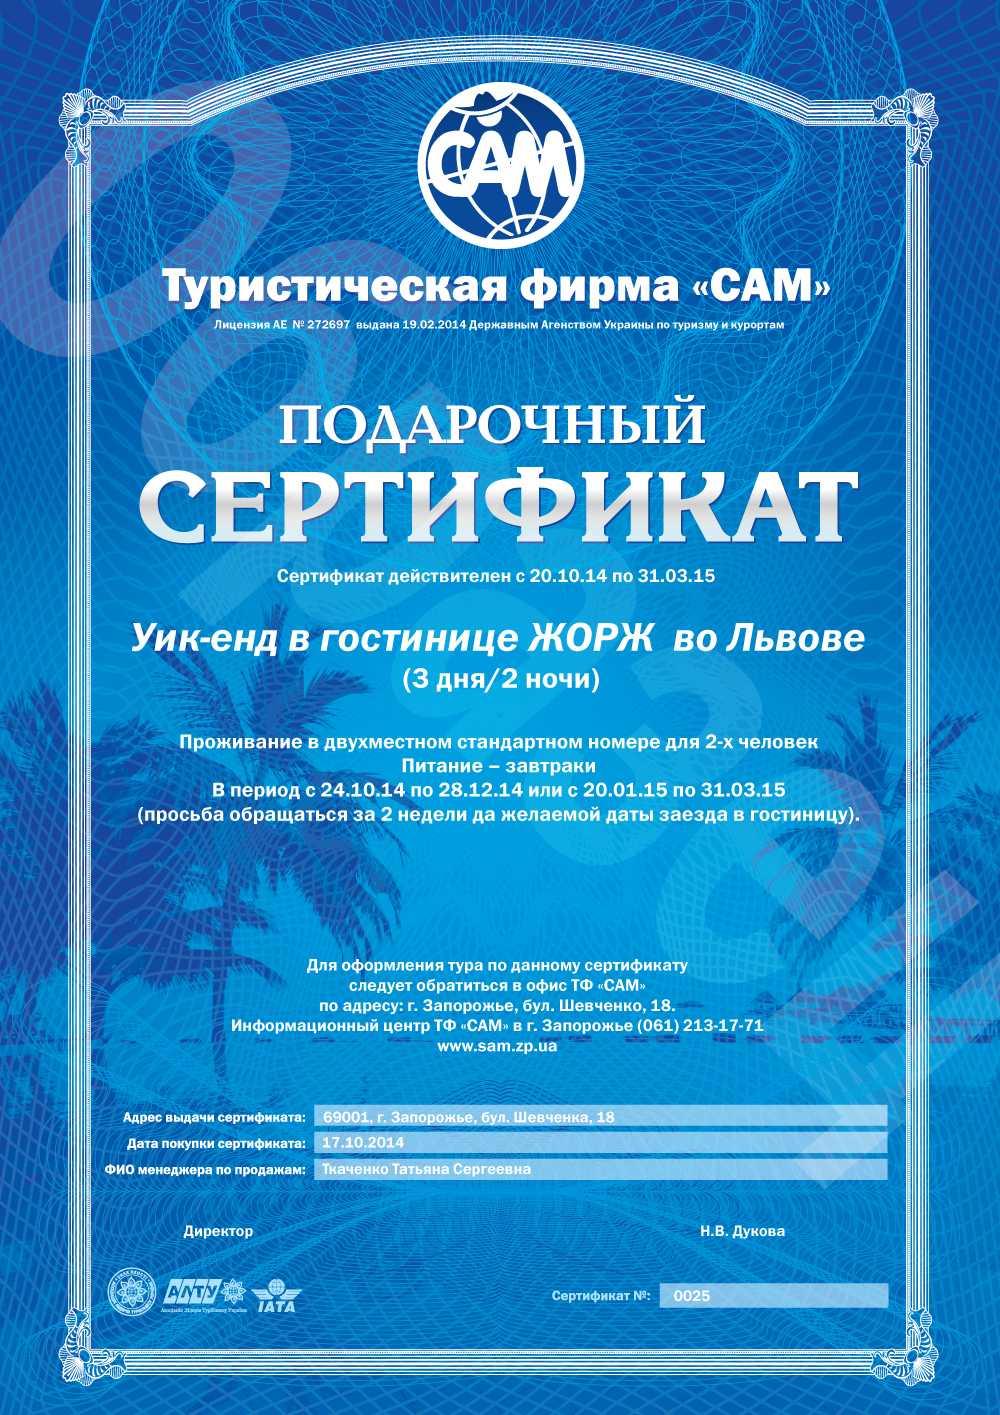 Турфирма САМ Запорожье - сертификат